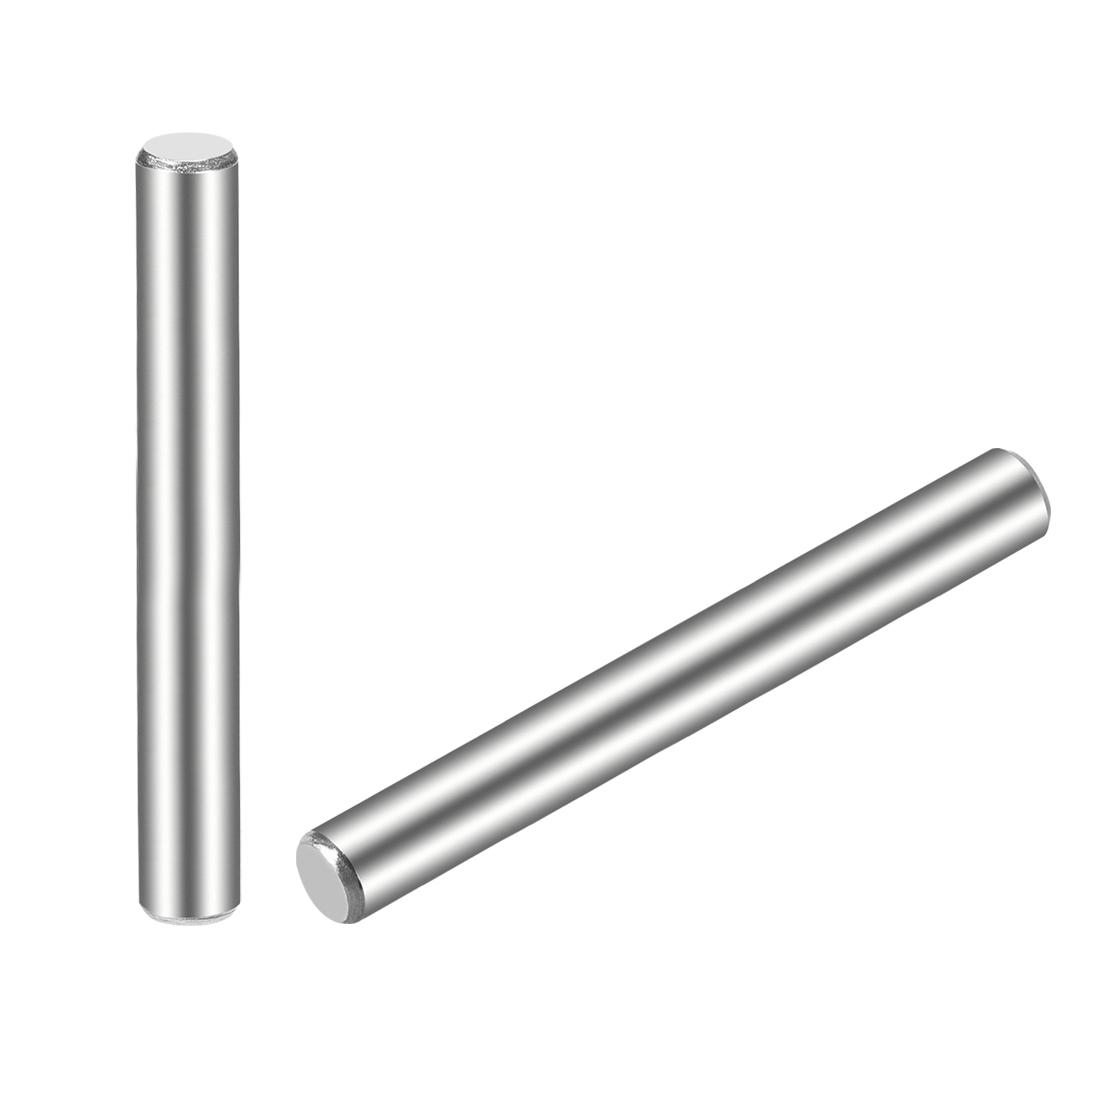 15Pcs 5mm x 55mm Dowel Pin 304 Stainless Steel Shelf Support Pin Fasten